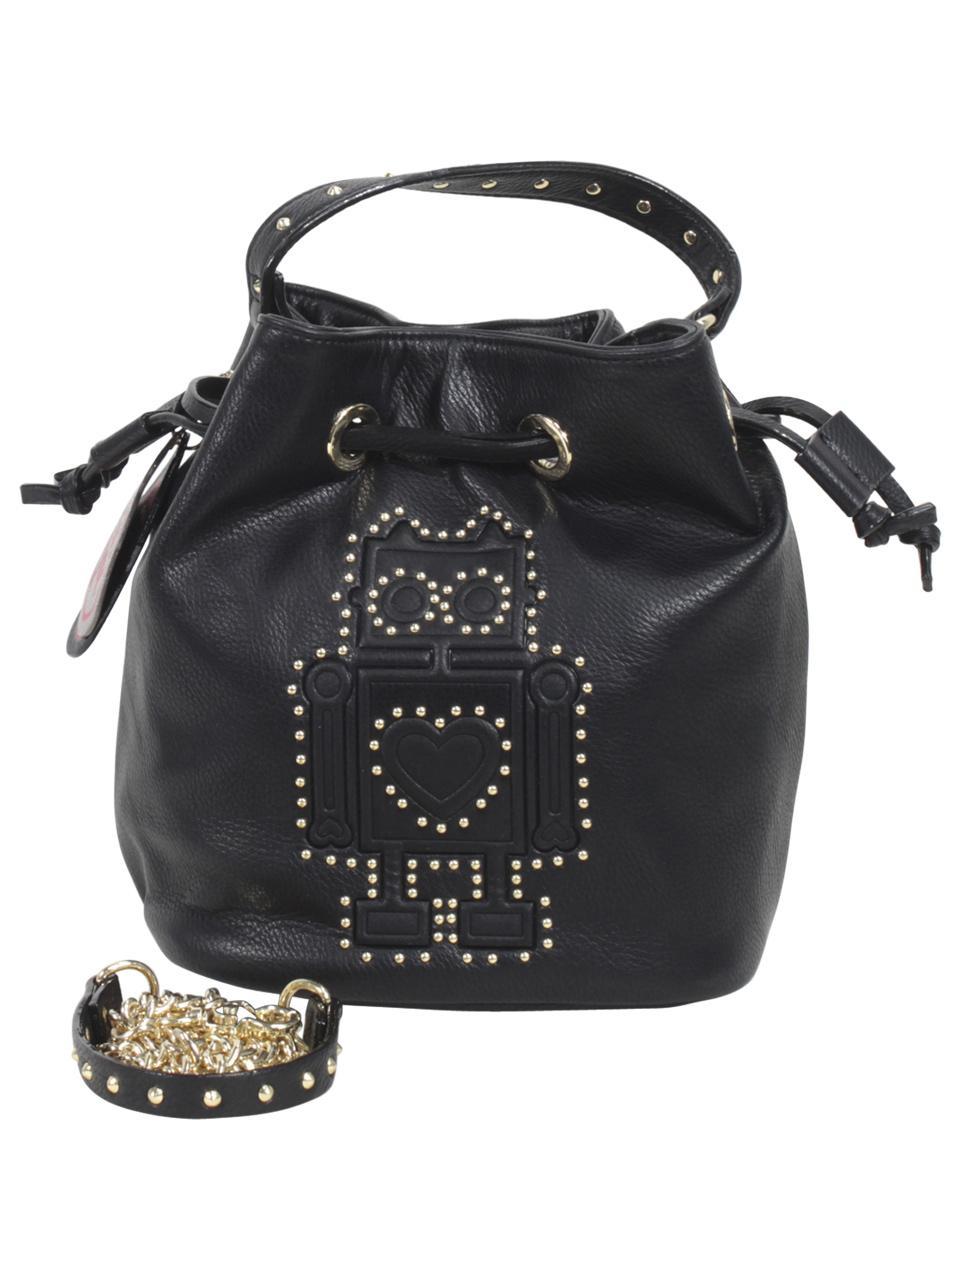 Betsey Johnson Women's Kiss And Tell Robot Bucket Crossbody Handbag